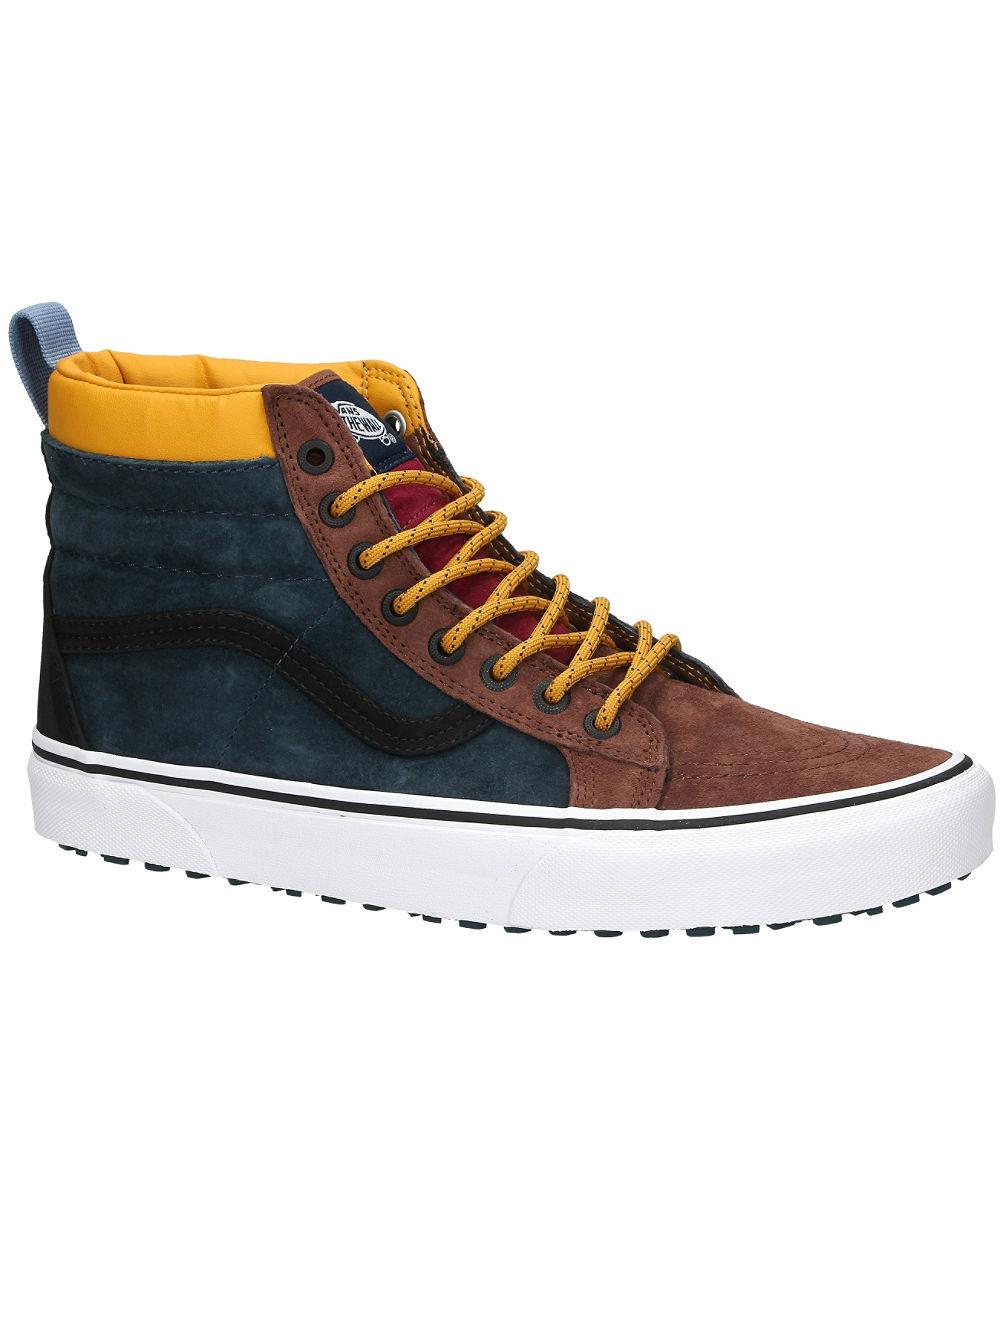 8b25267d43b934 Buy Vans Sk8-Hi Mte Sneakers online at Blue Tomato